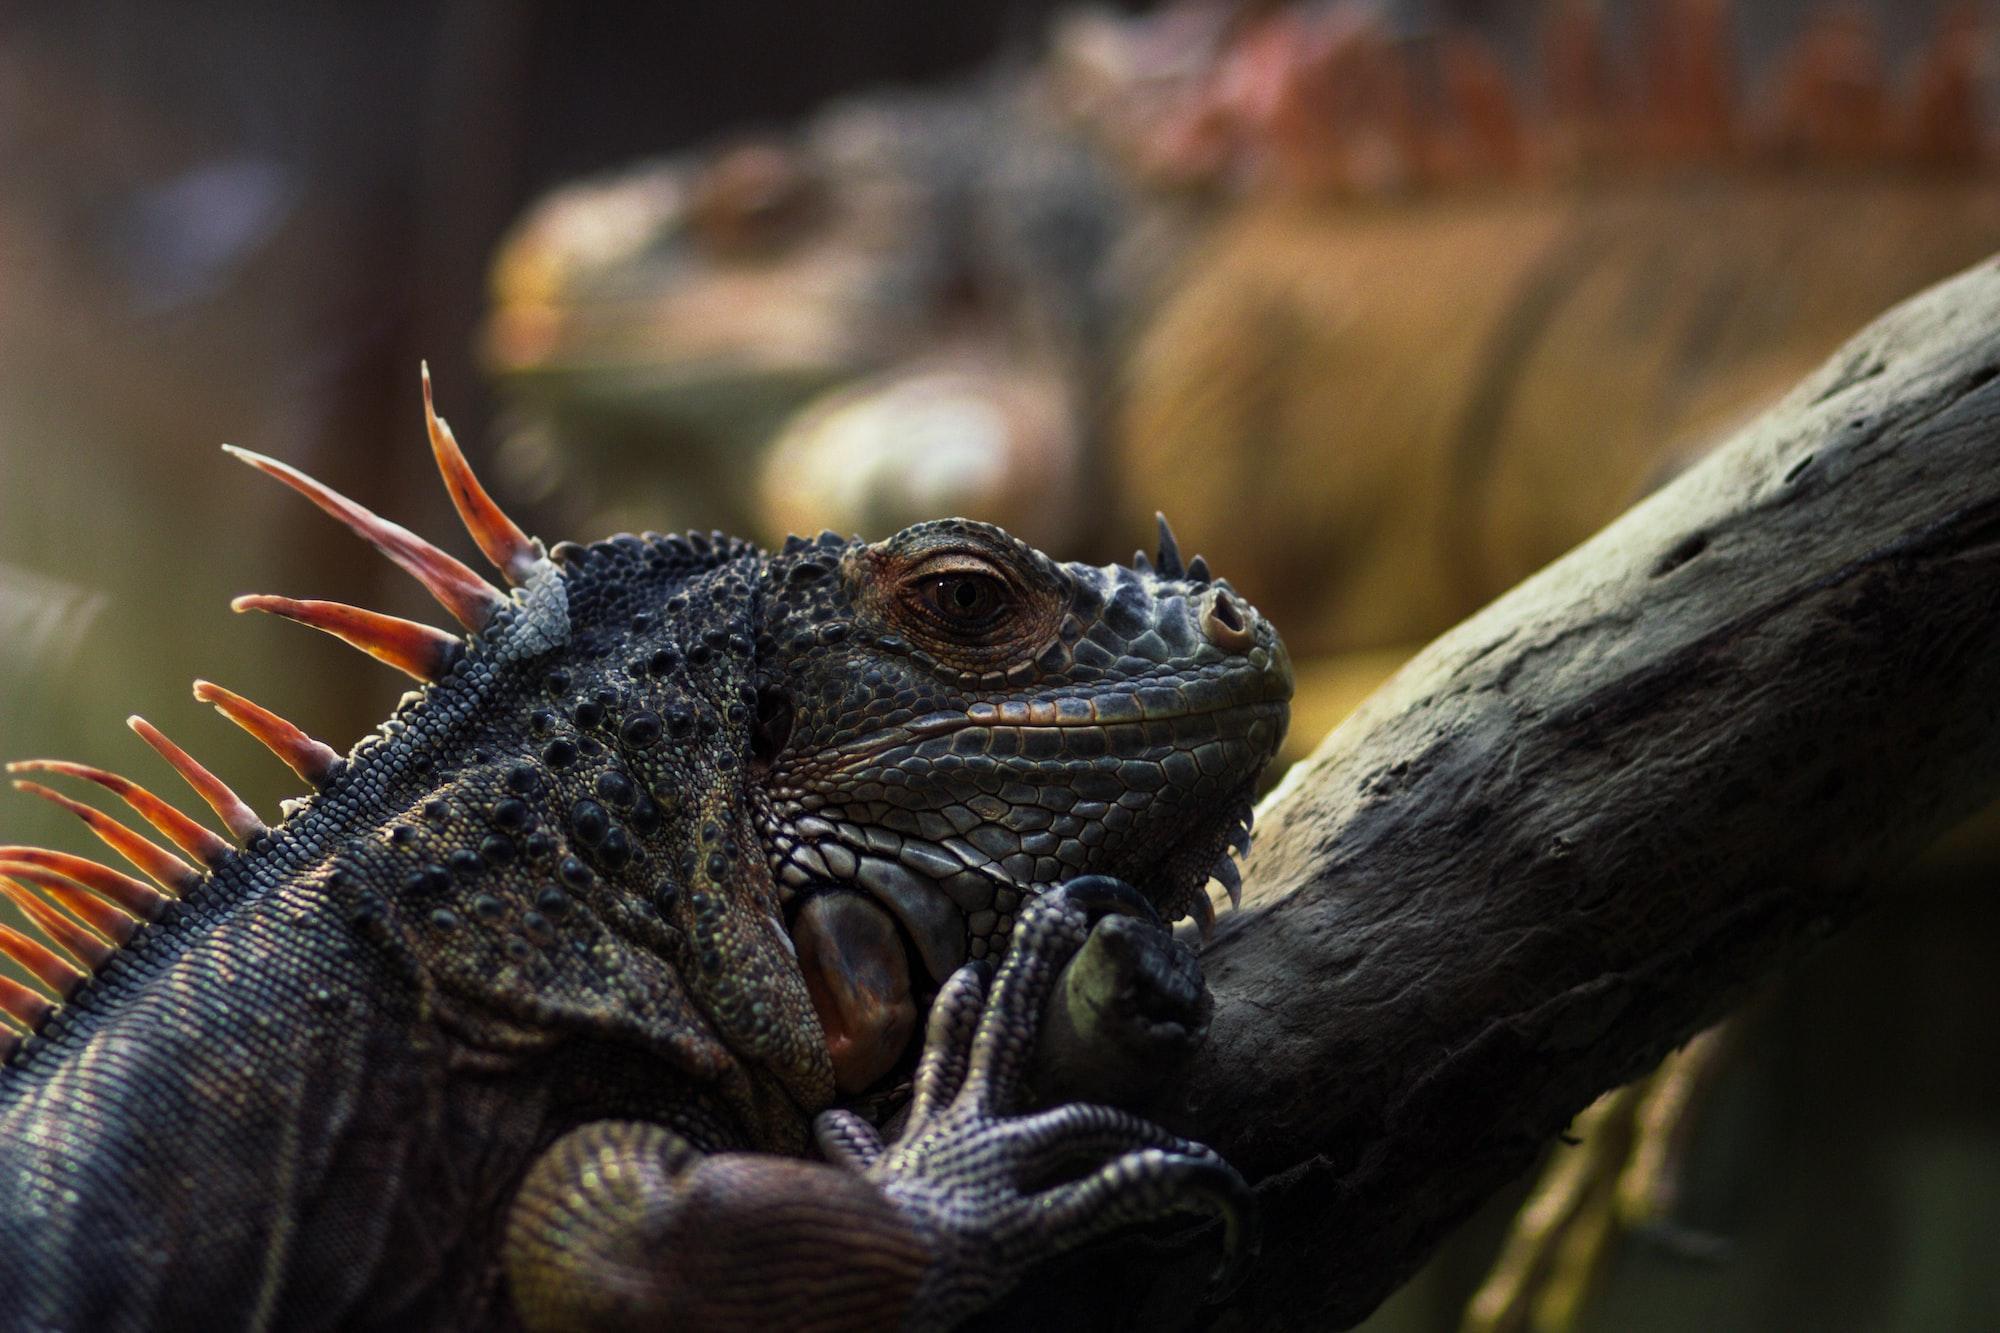 Smile for me, iguana